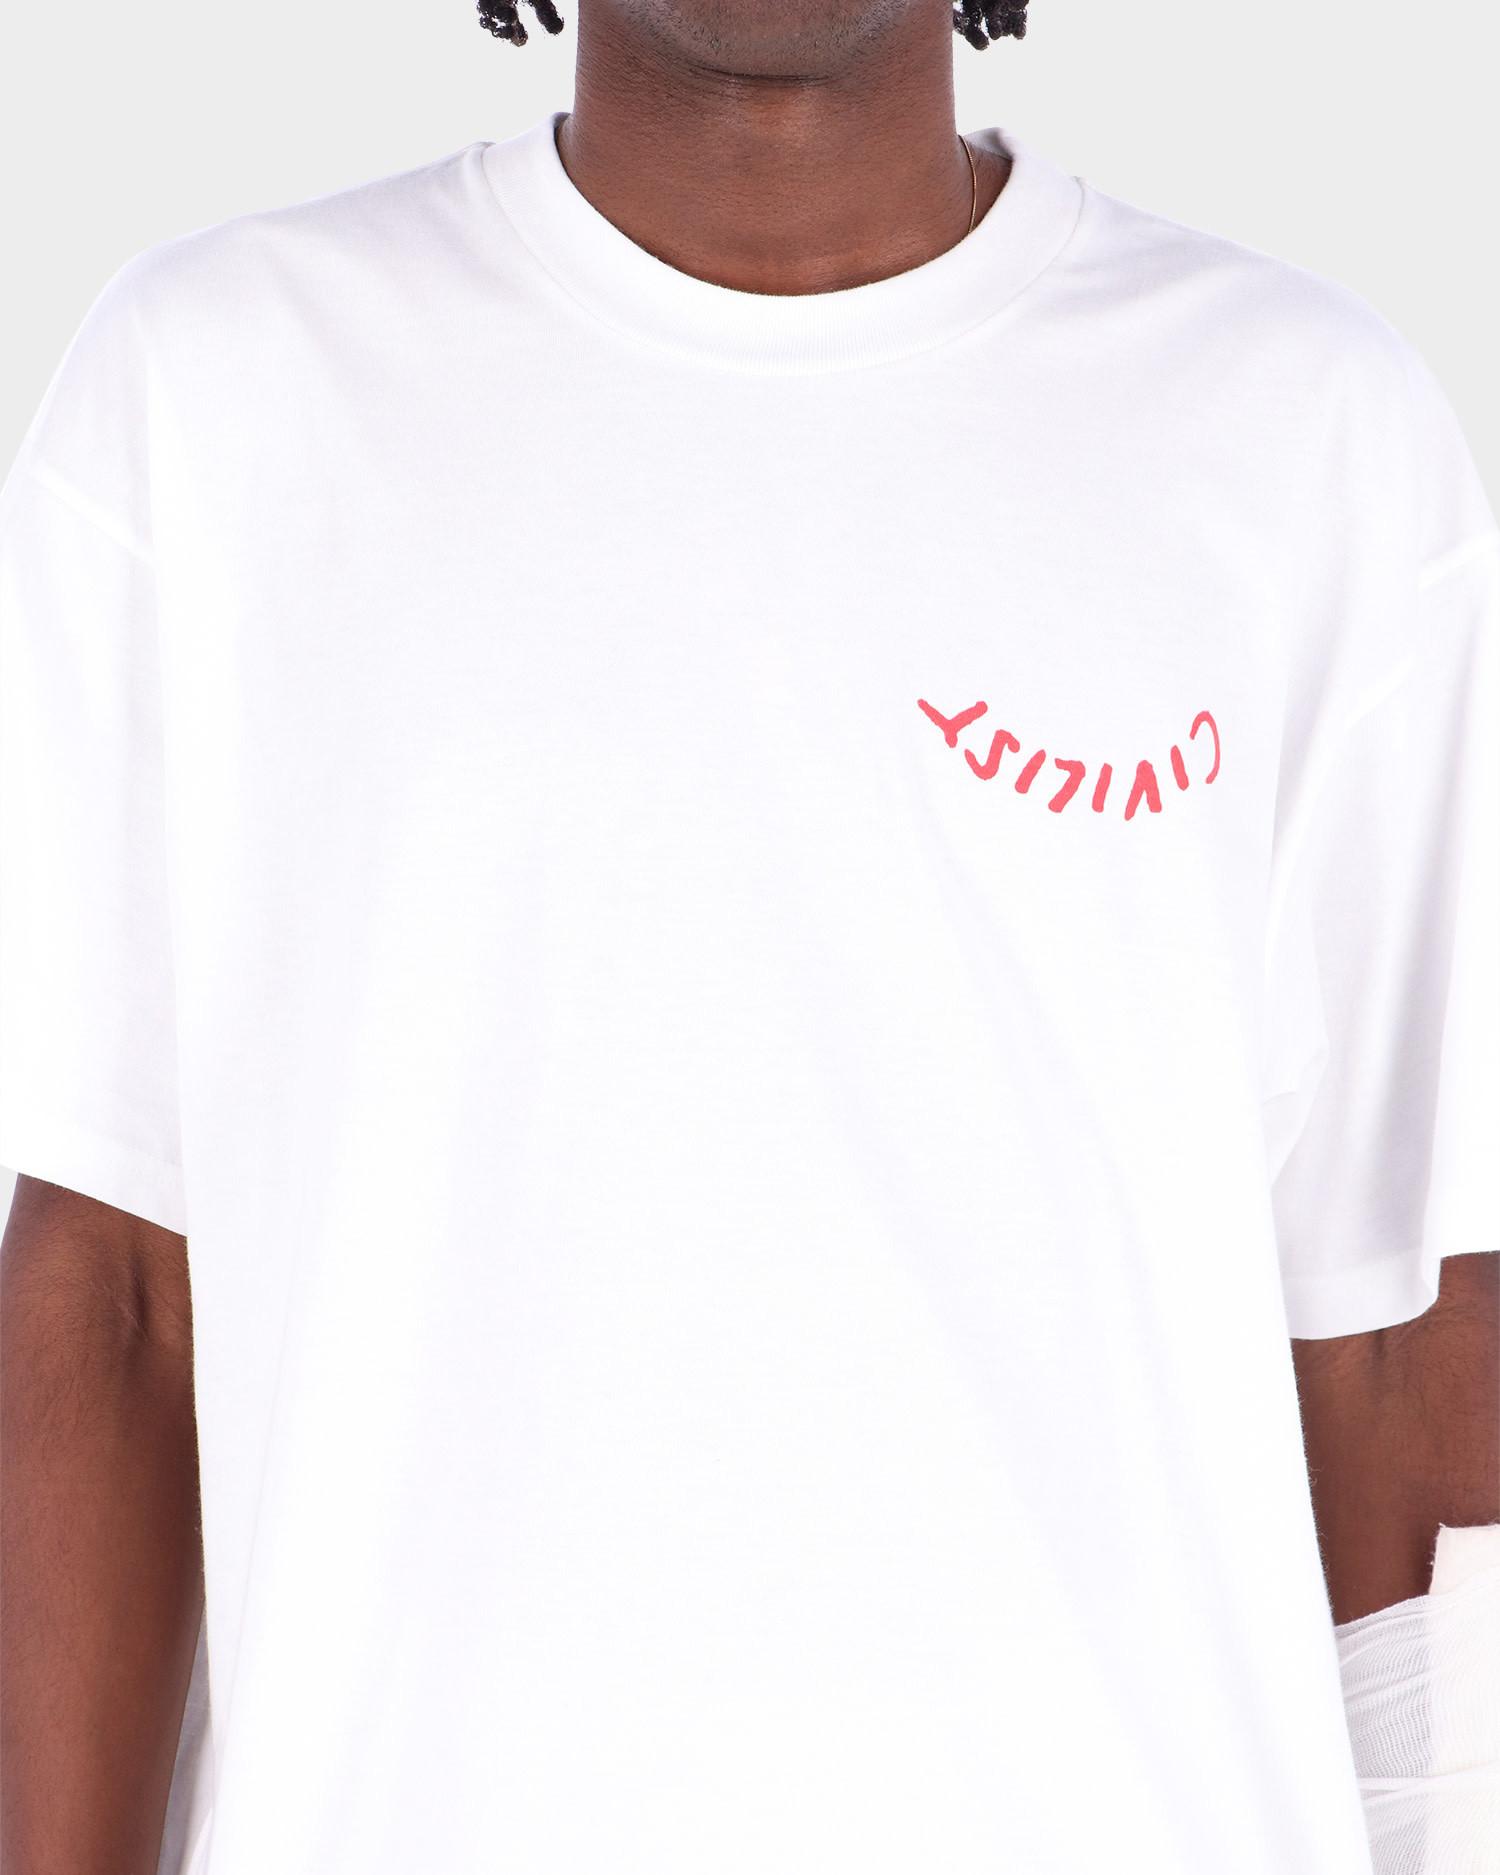 Carhartt X Civilist Logo T-Shirt White